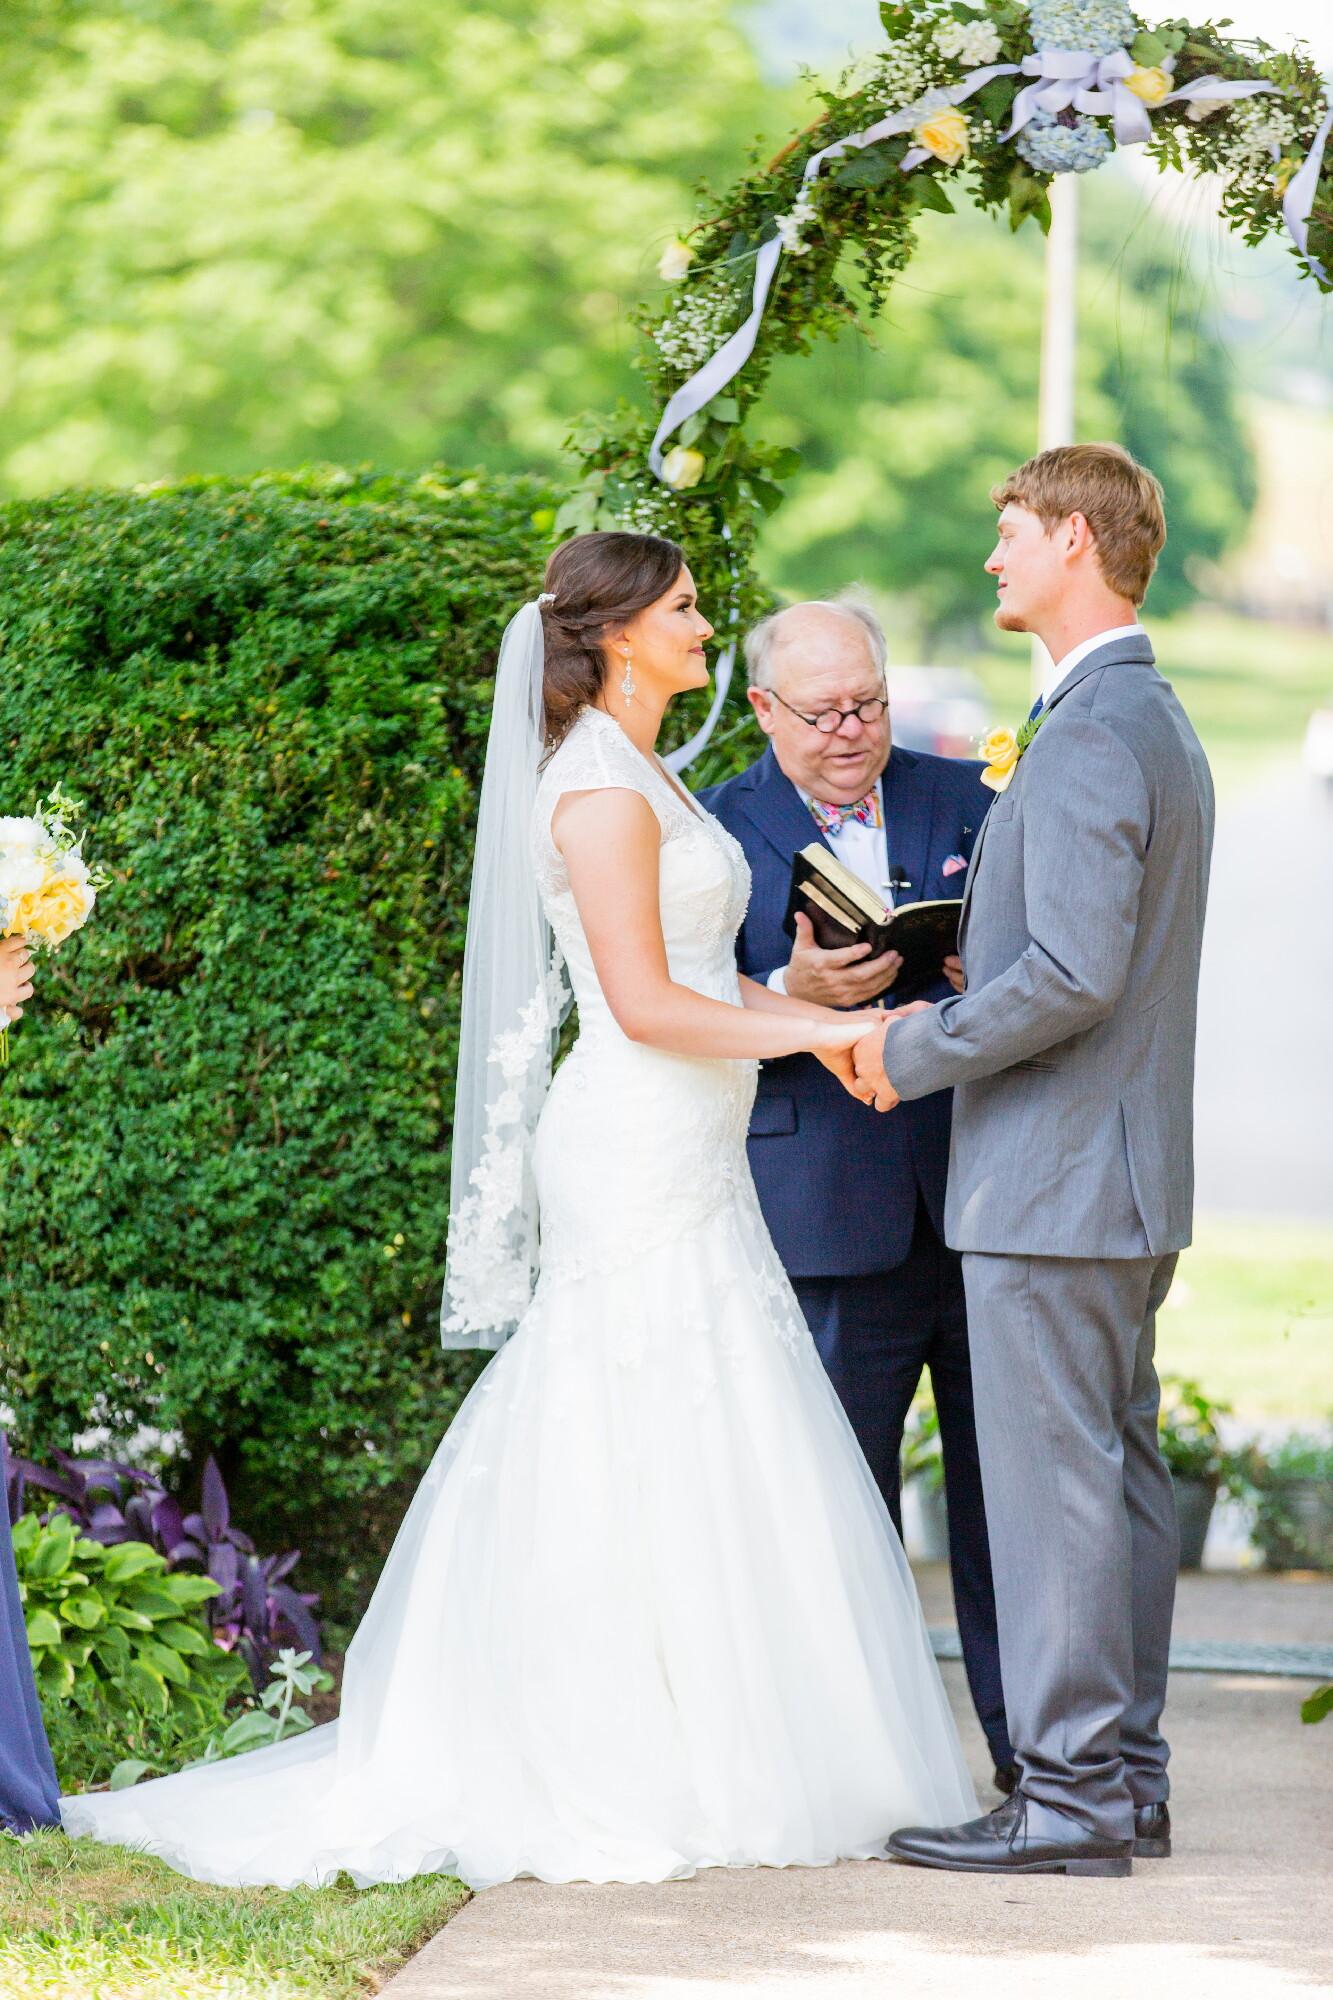 wedding ceremony(1).jpeg